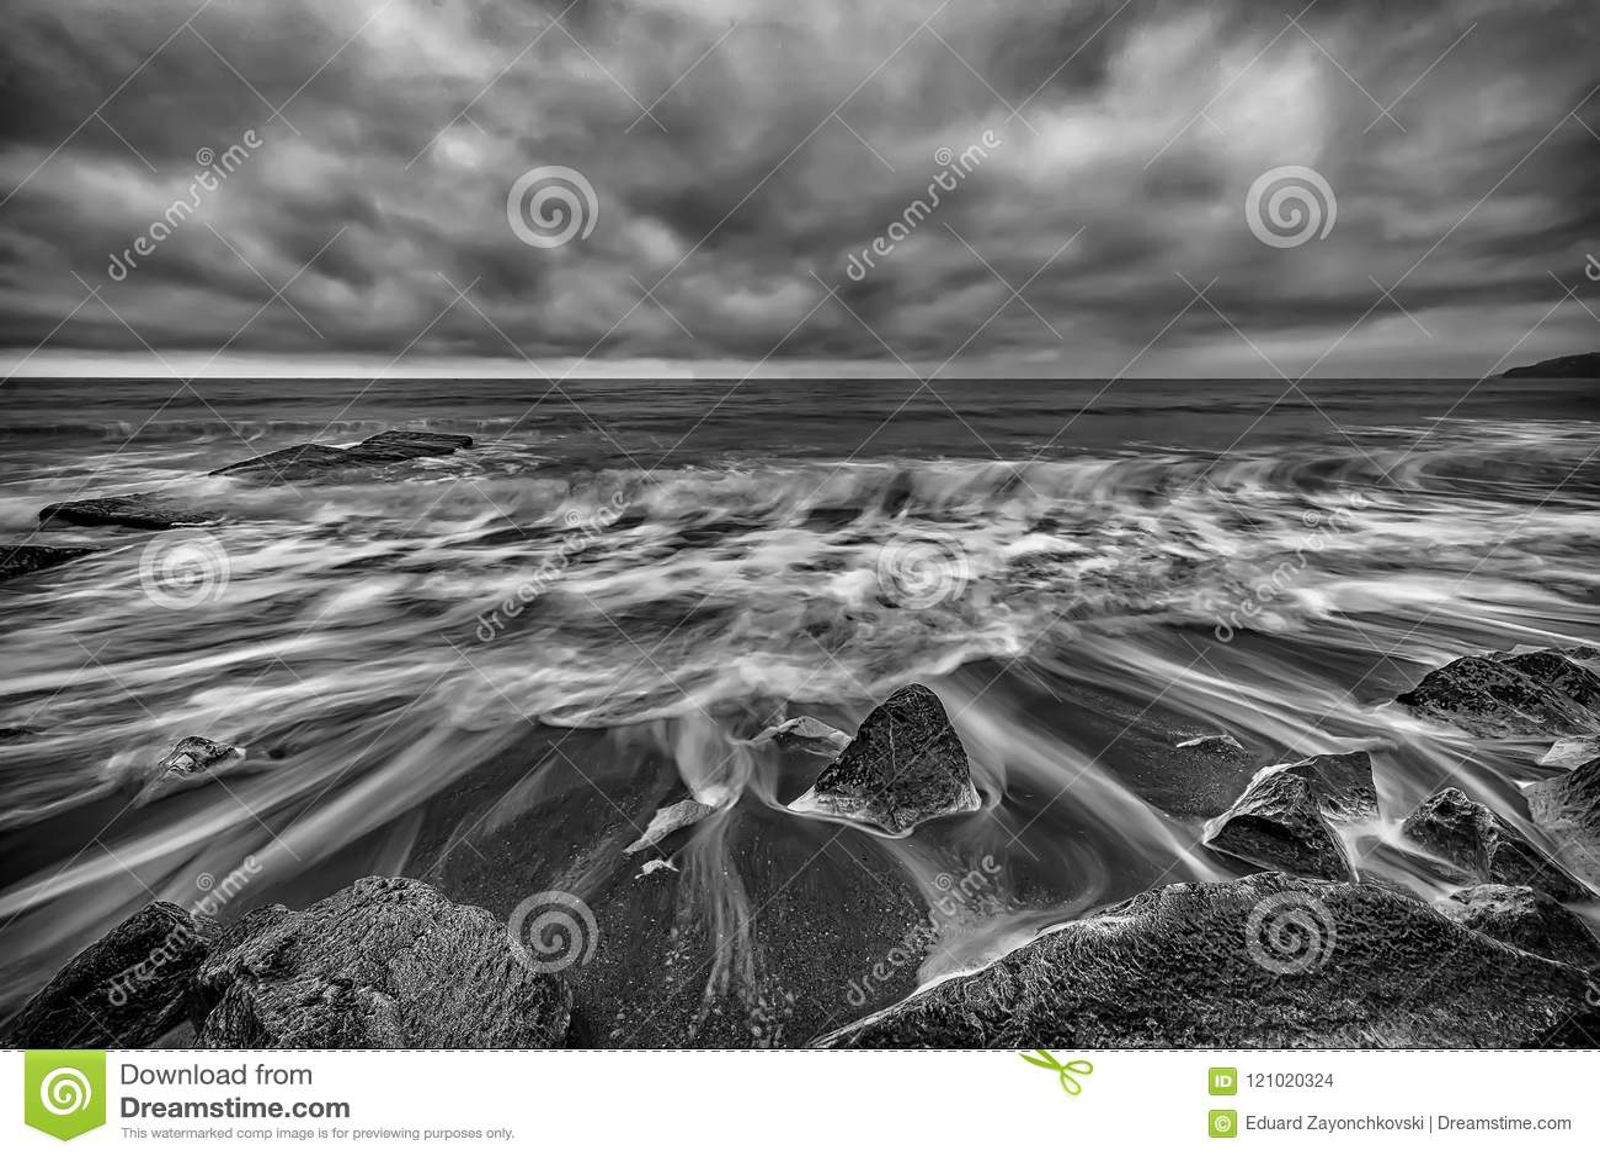 Stunning black and white seascape stock photo image of background